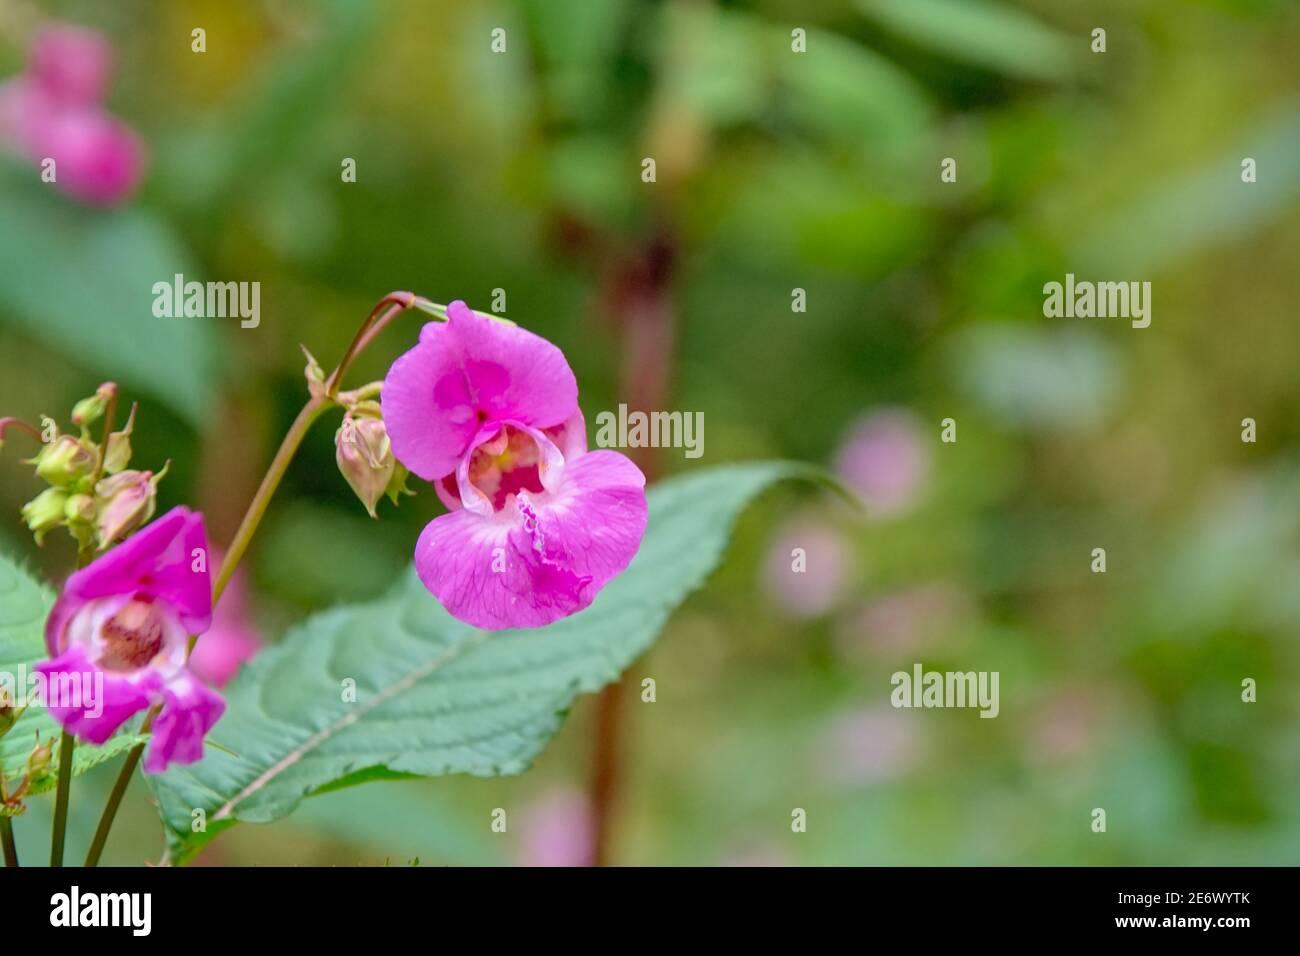 Leuchtend rosa Himalaya Balsam Blume - Impatiens glandurifera Stockfoto